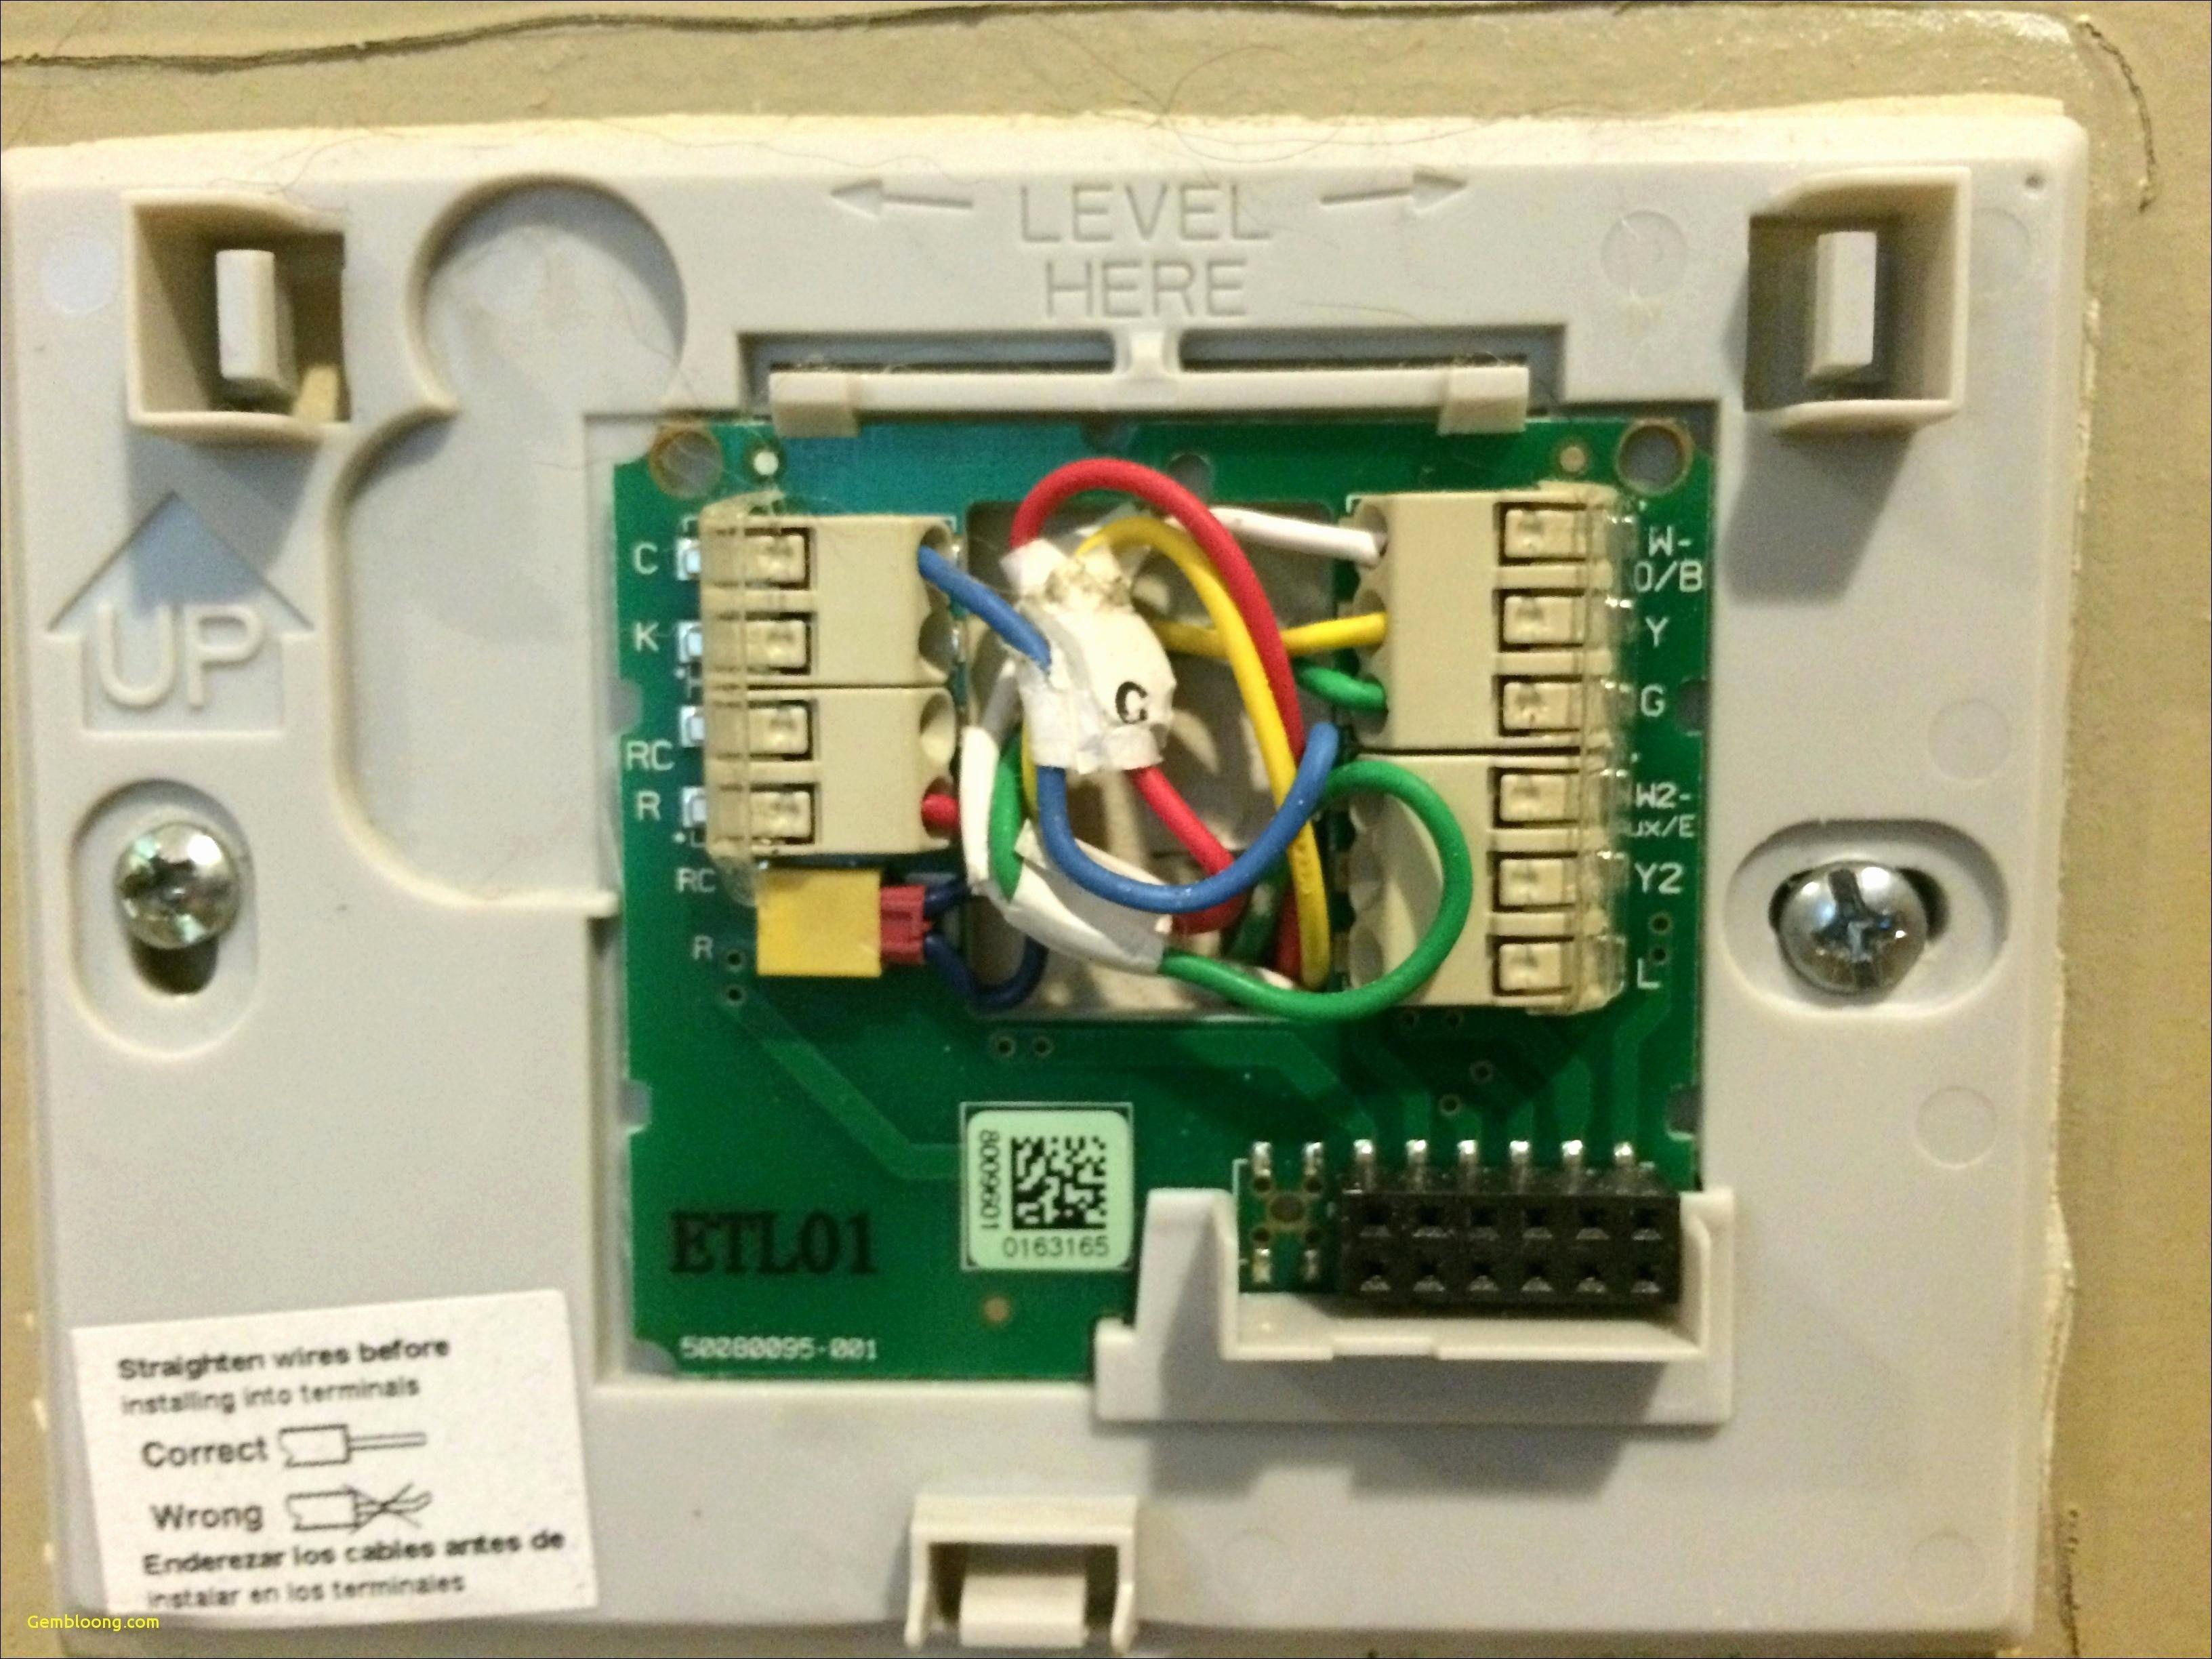 New Honeywell thermostat Rth7600 Wiring Diagram diagram